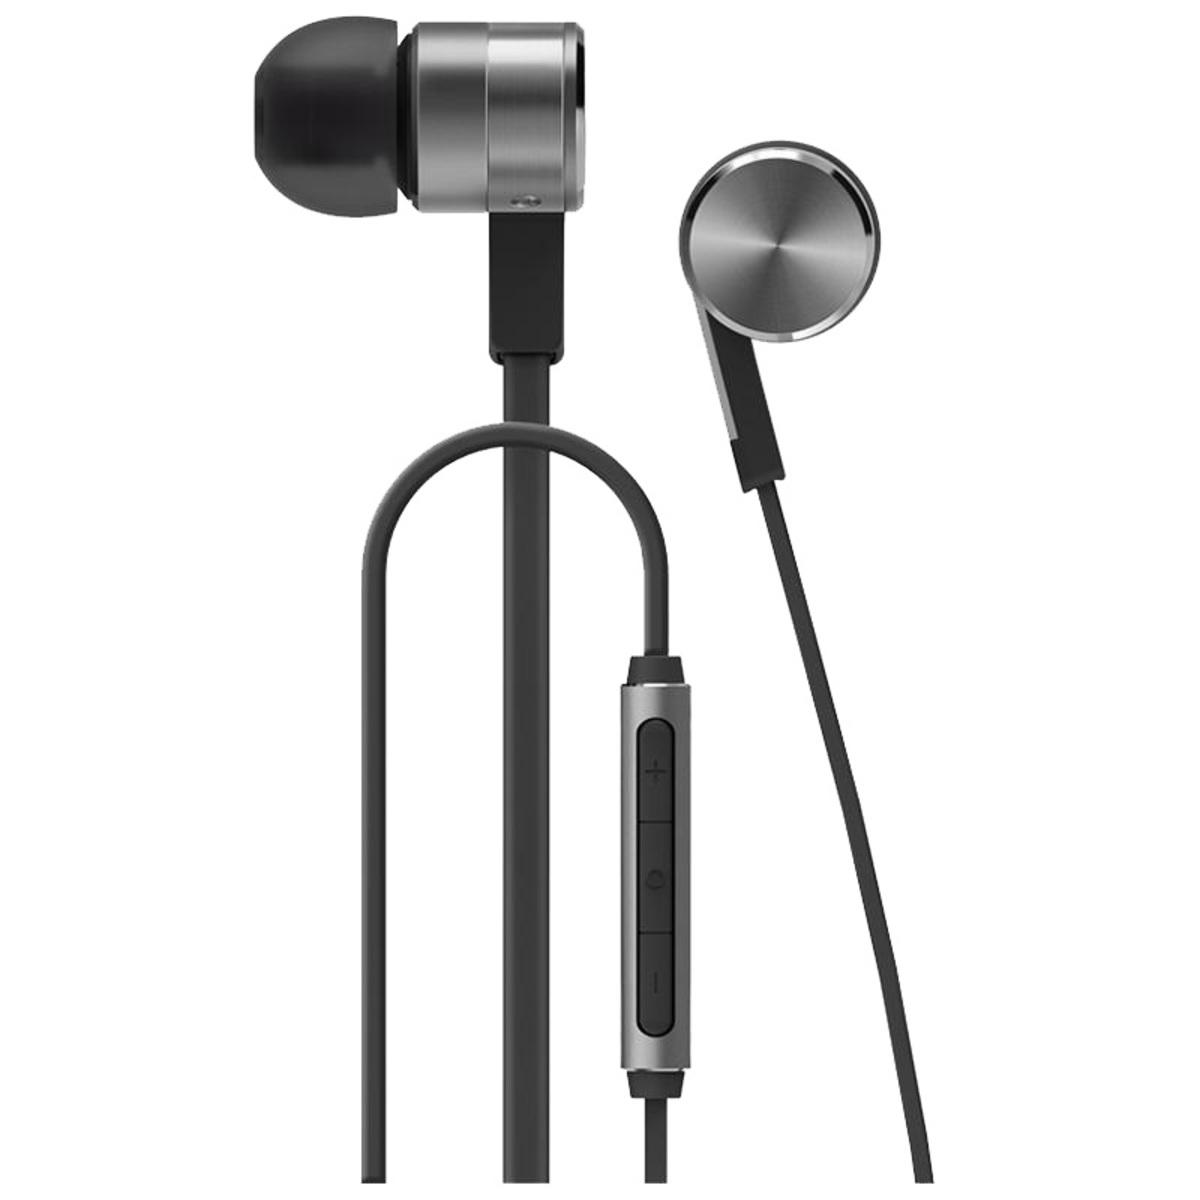 AM13 Engine 2 In-ear Earphones with Mic(Grey)